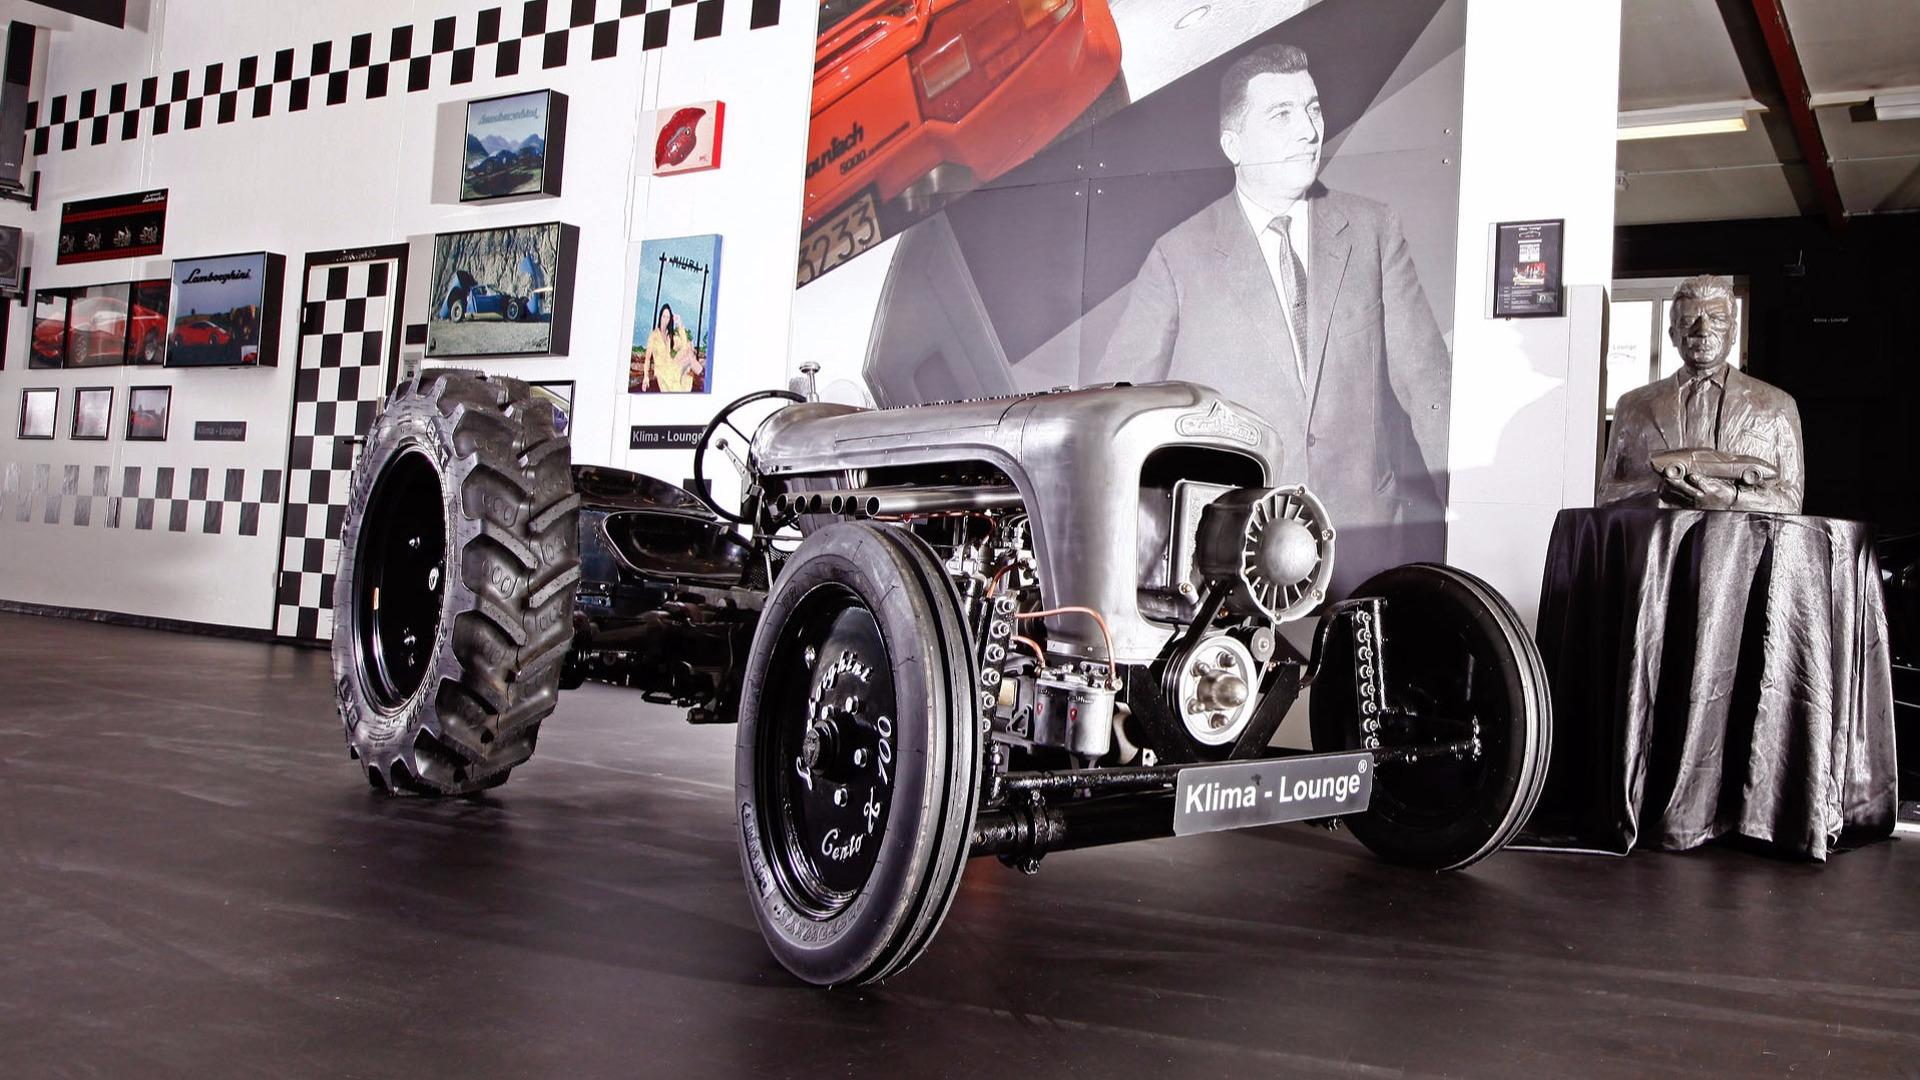 Beliebt Bevorzugt 5 Lamborghini Centenario Tractors To Be Built At $266K Each #TH_63